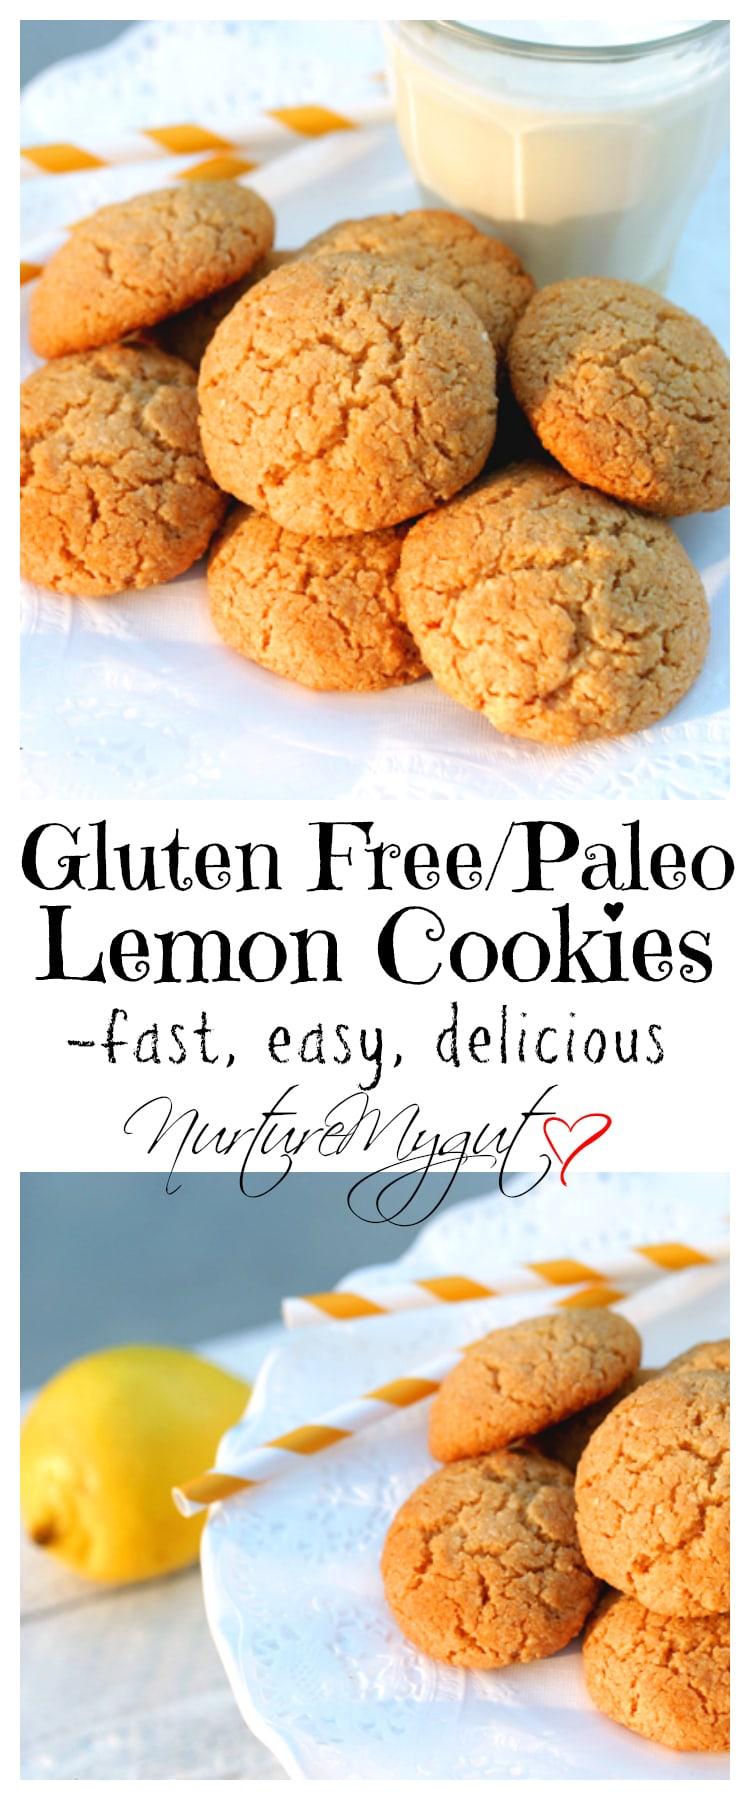 Gluten Free Lemon Cookies {Paleo}